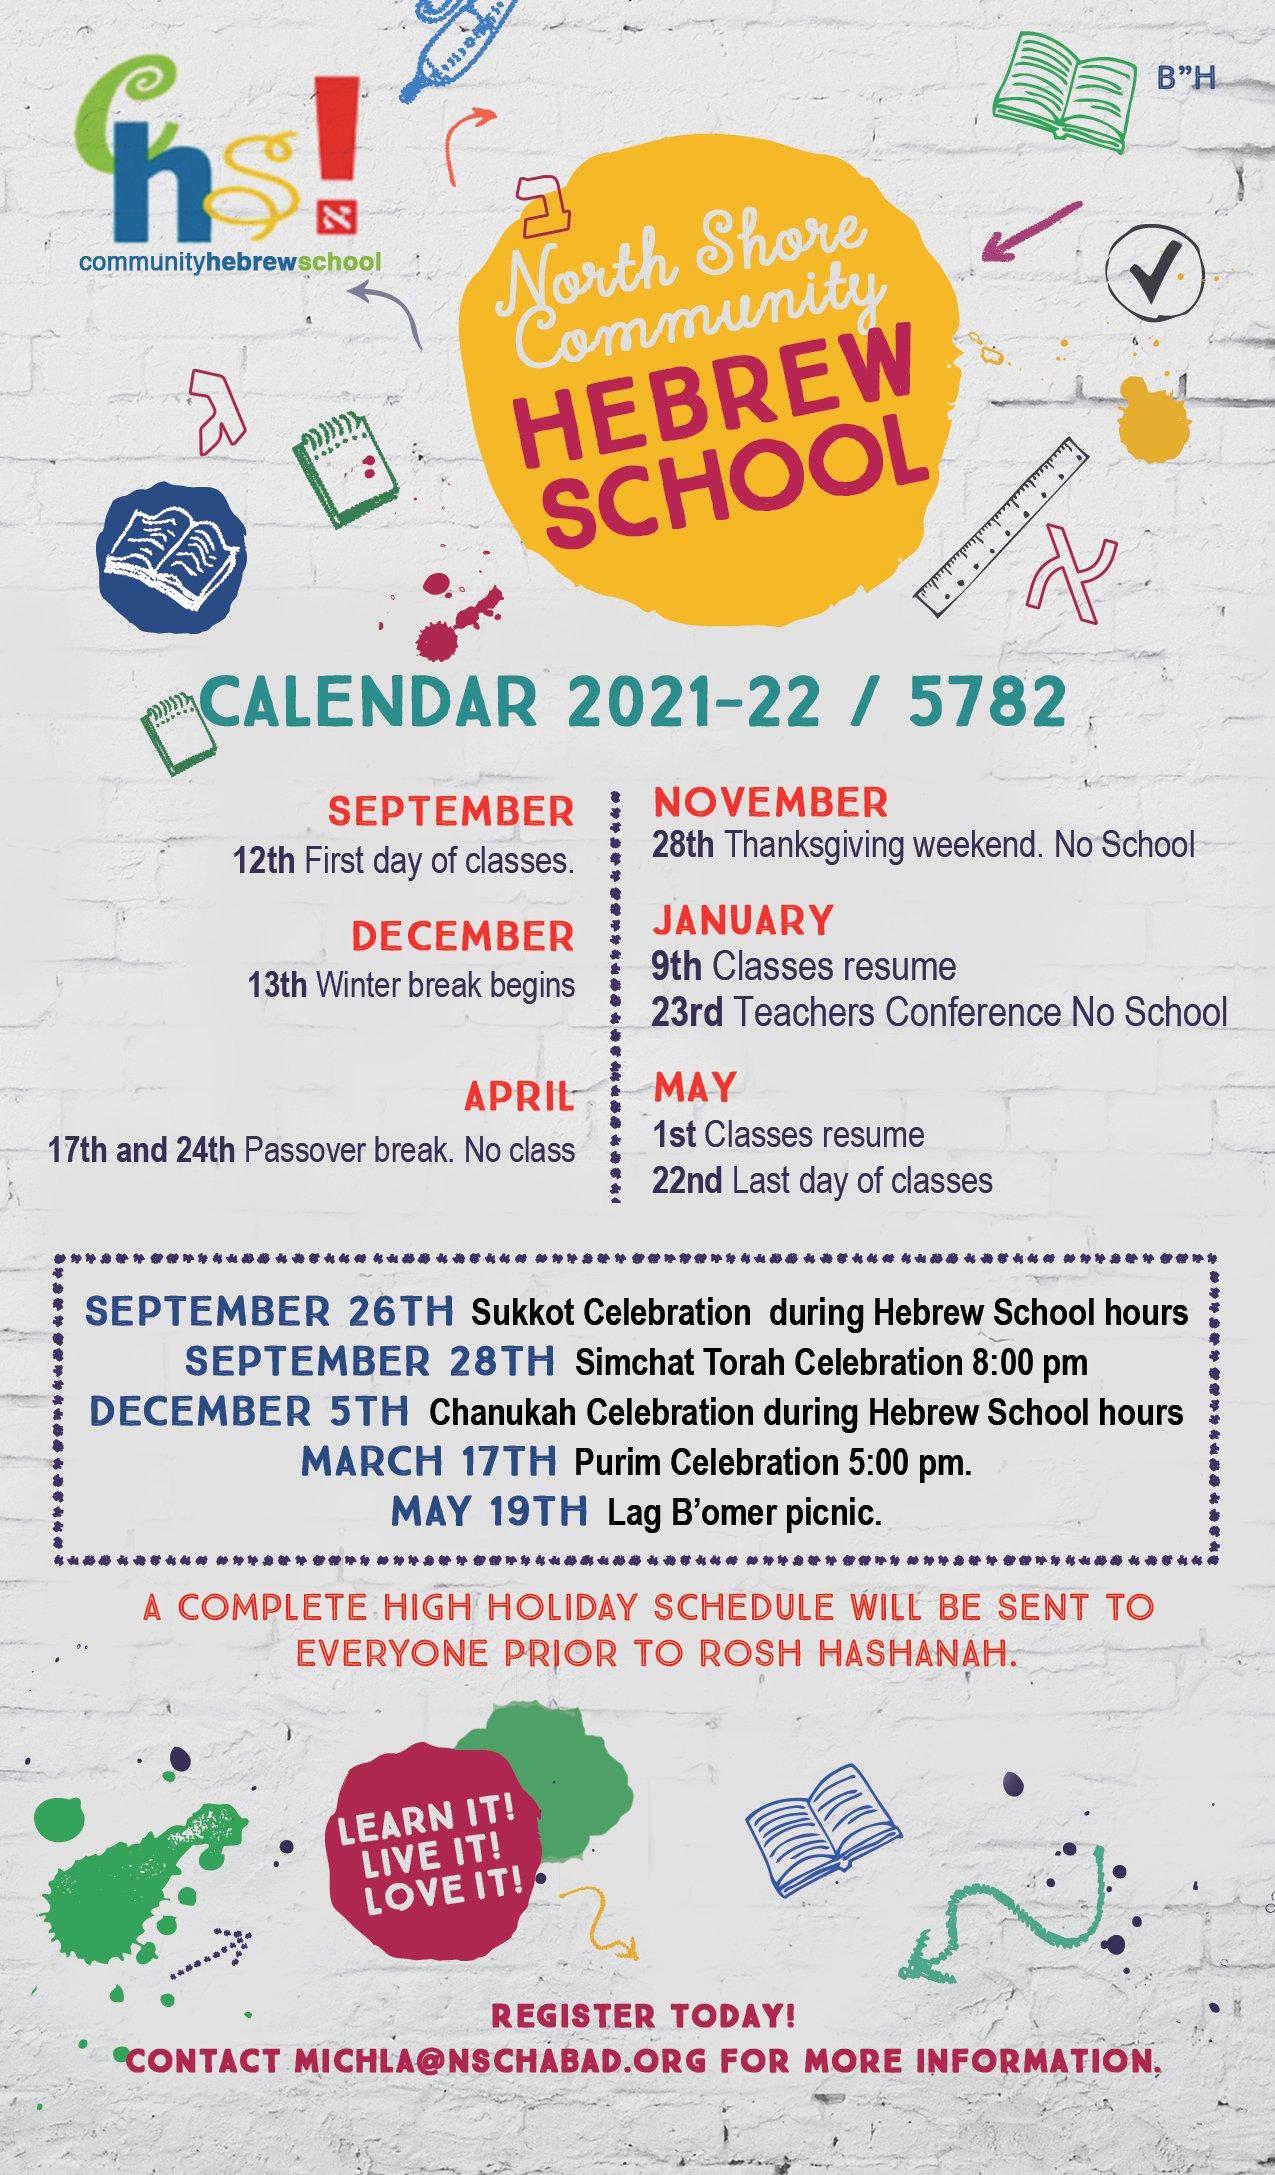 NS_ChabadHebrewSchool_Magnet 2020 rv2.jpg